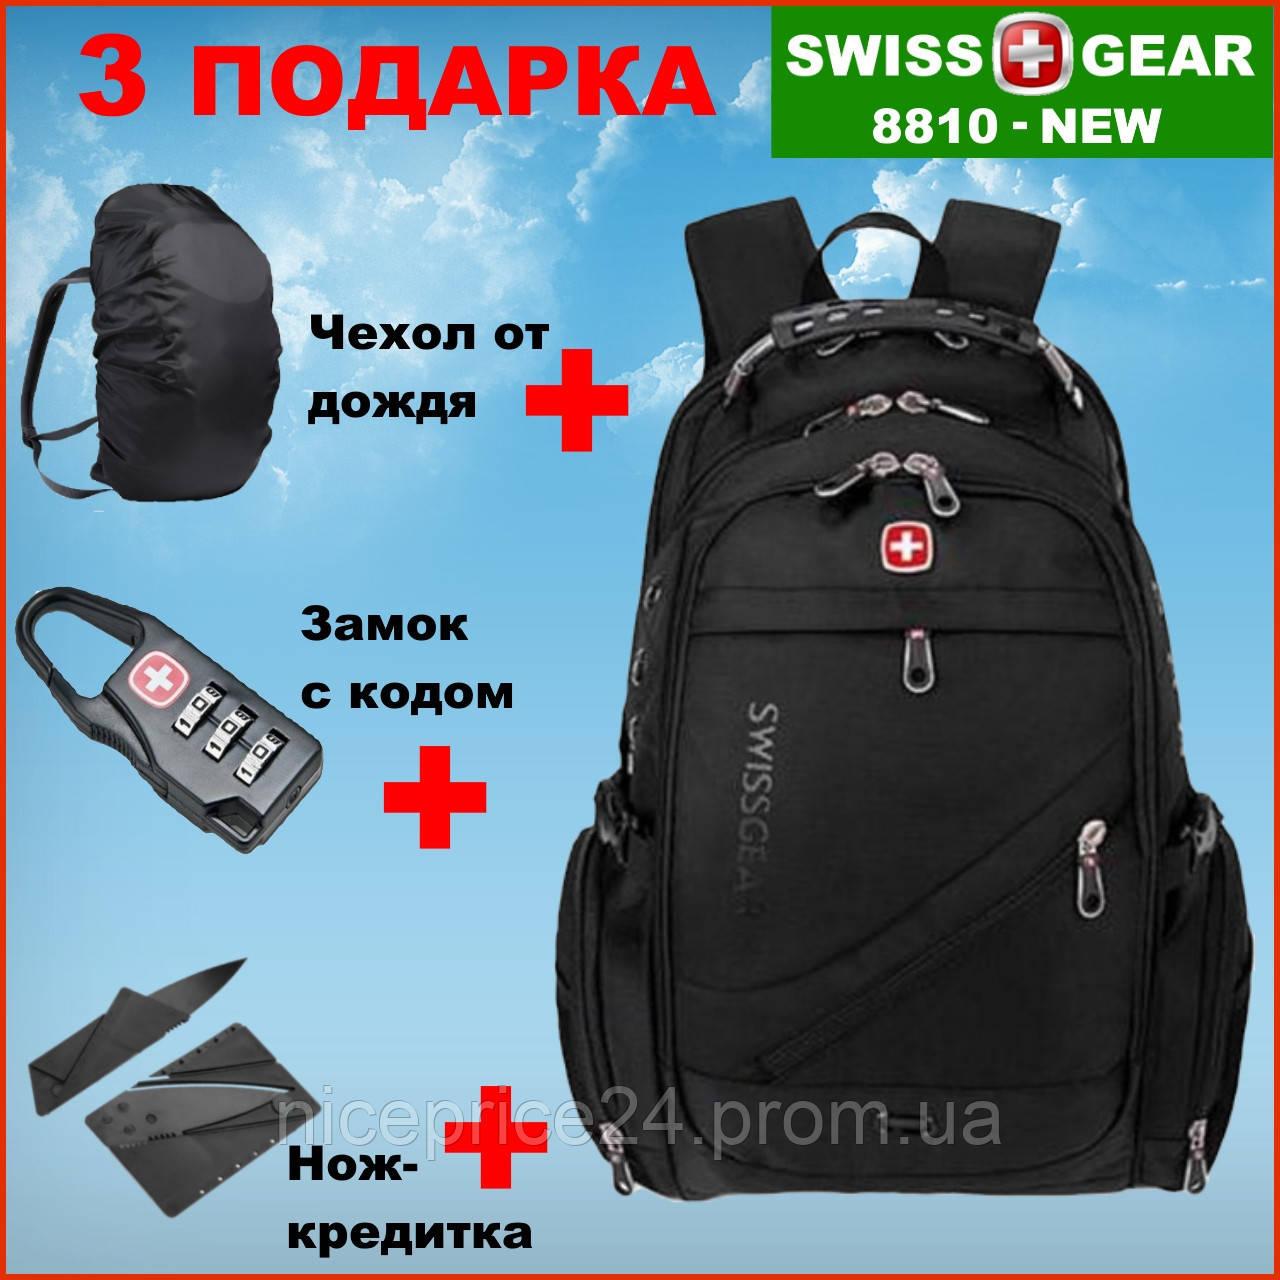 1fc6ab8f202c88 Швейцарский рюкзак WENGER SwissGear 8810 black с  замком,нож-кредитка,дождевик, USB